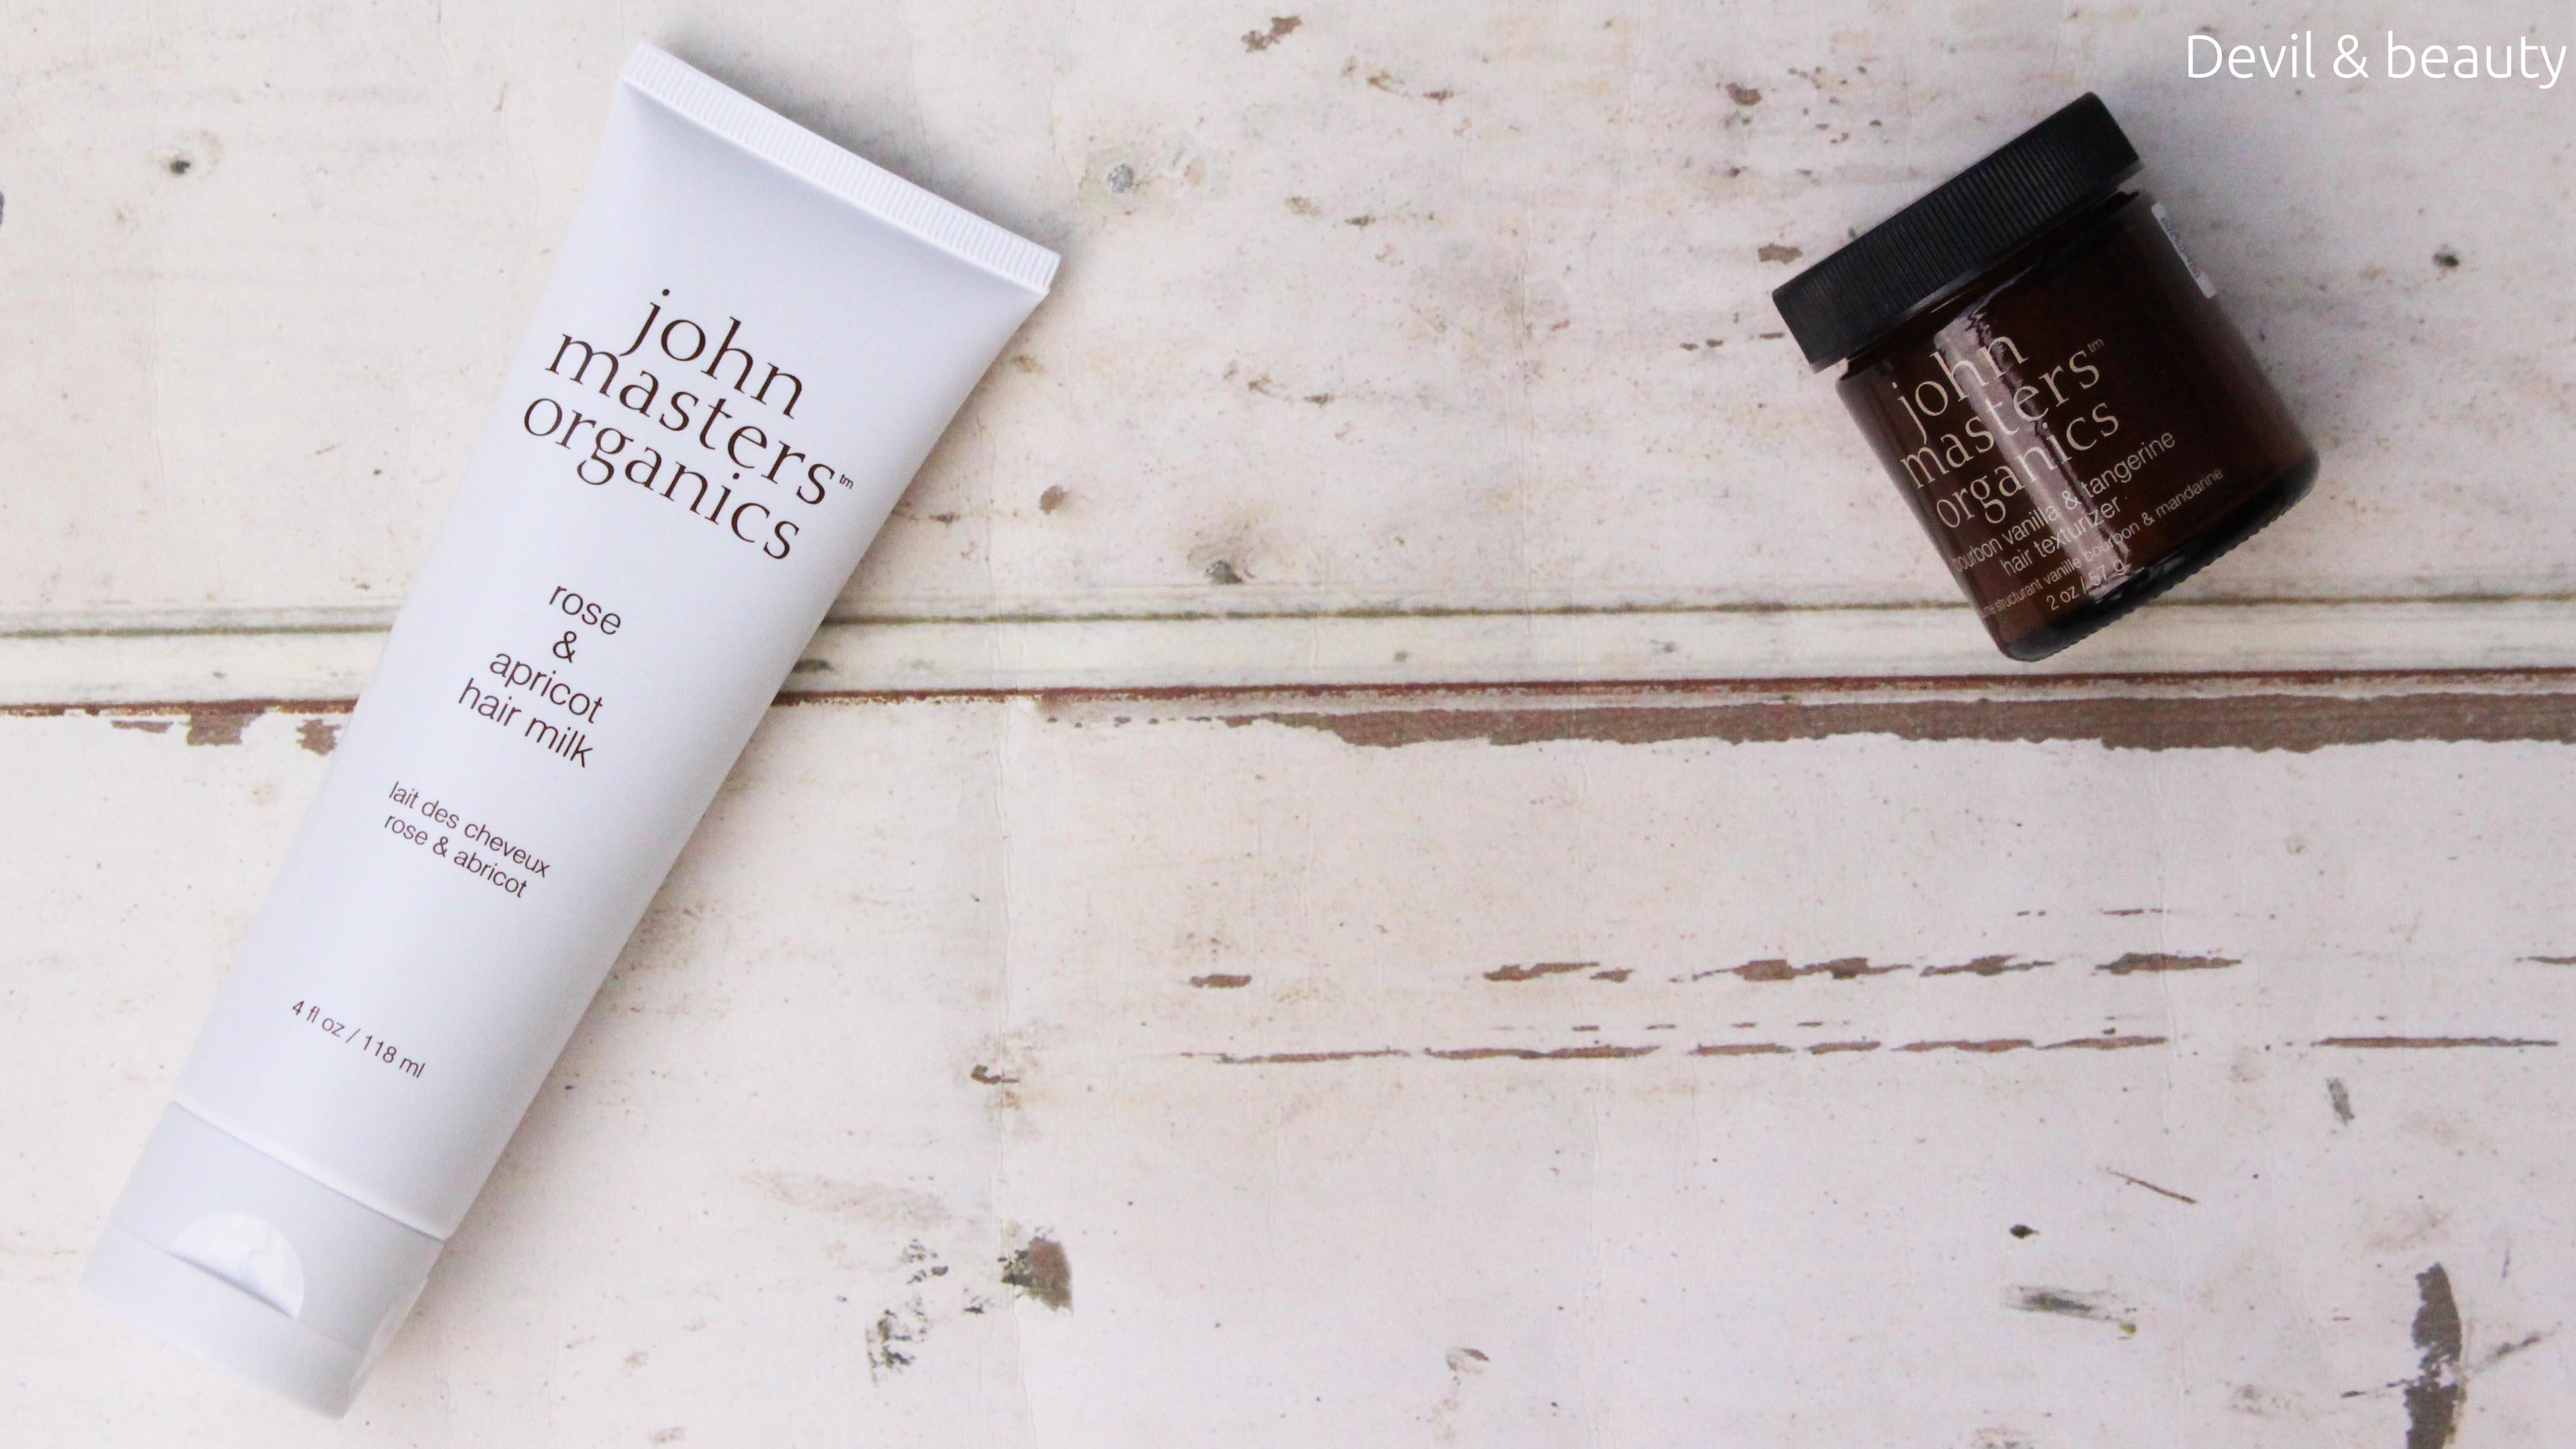 johnmasters-organics-bourbon-vanilla-tangerine-hair-texturizer10 - image